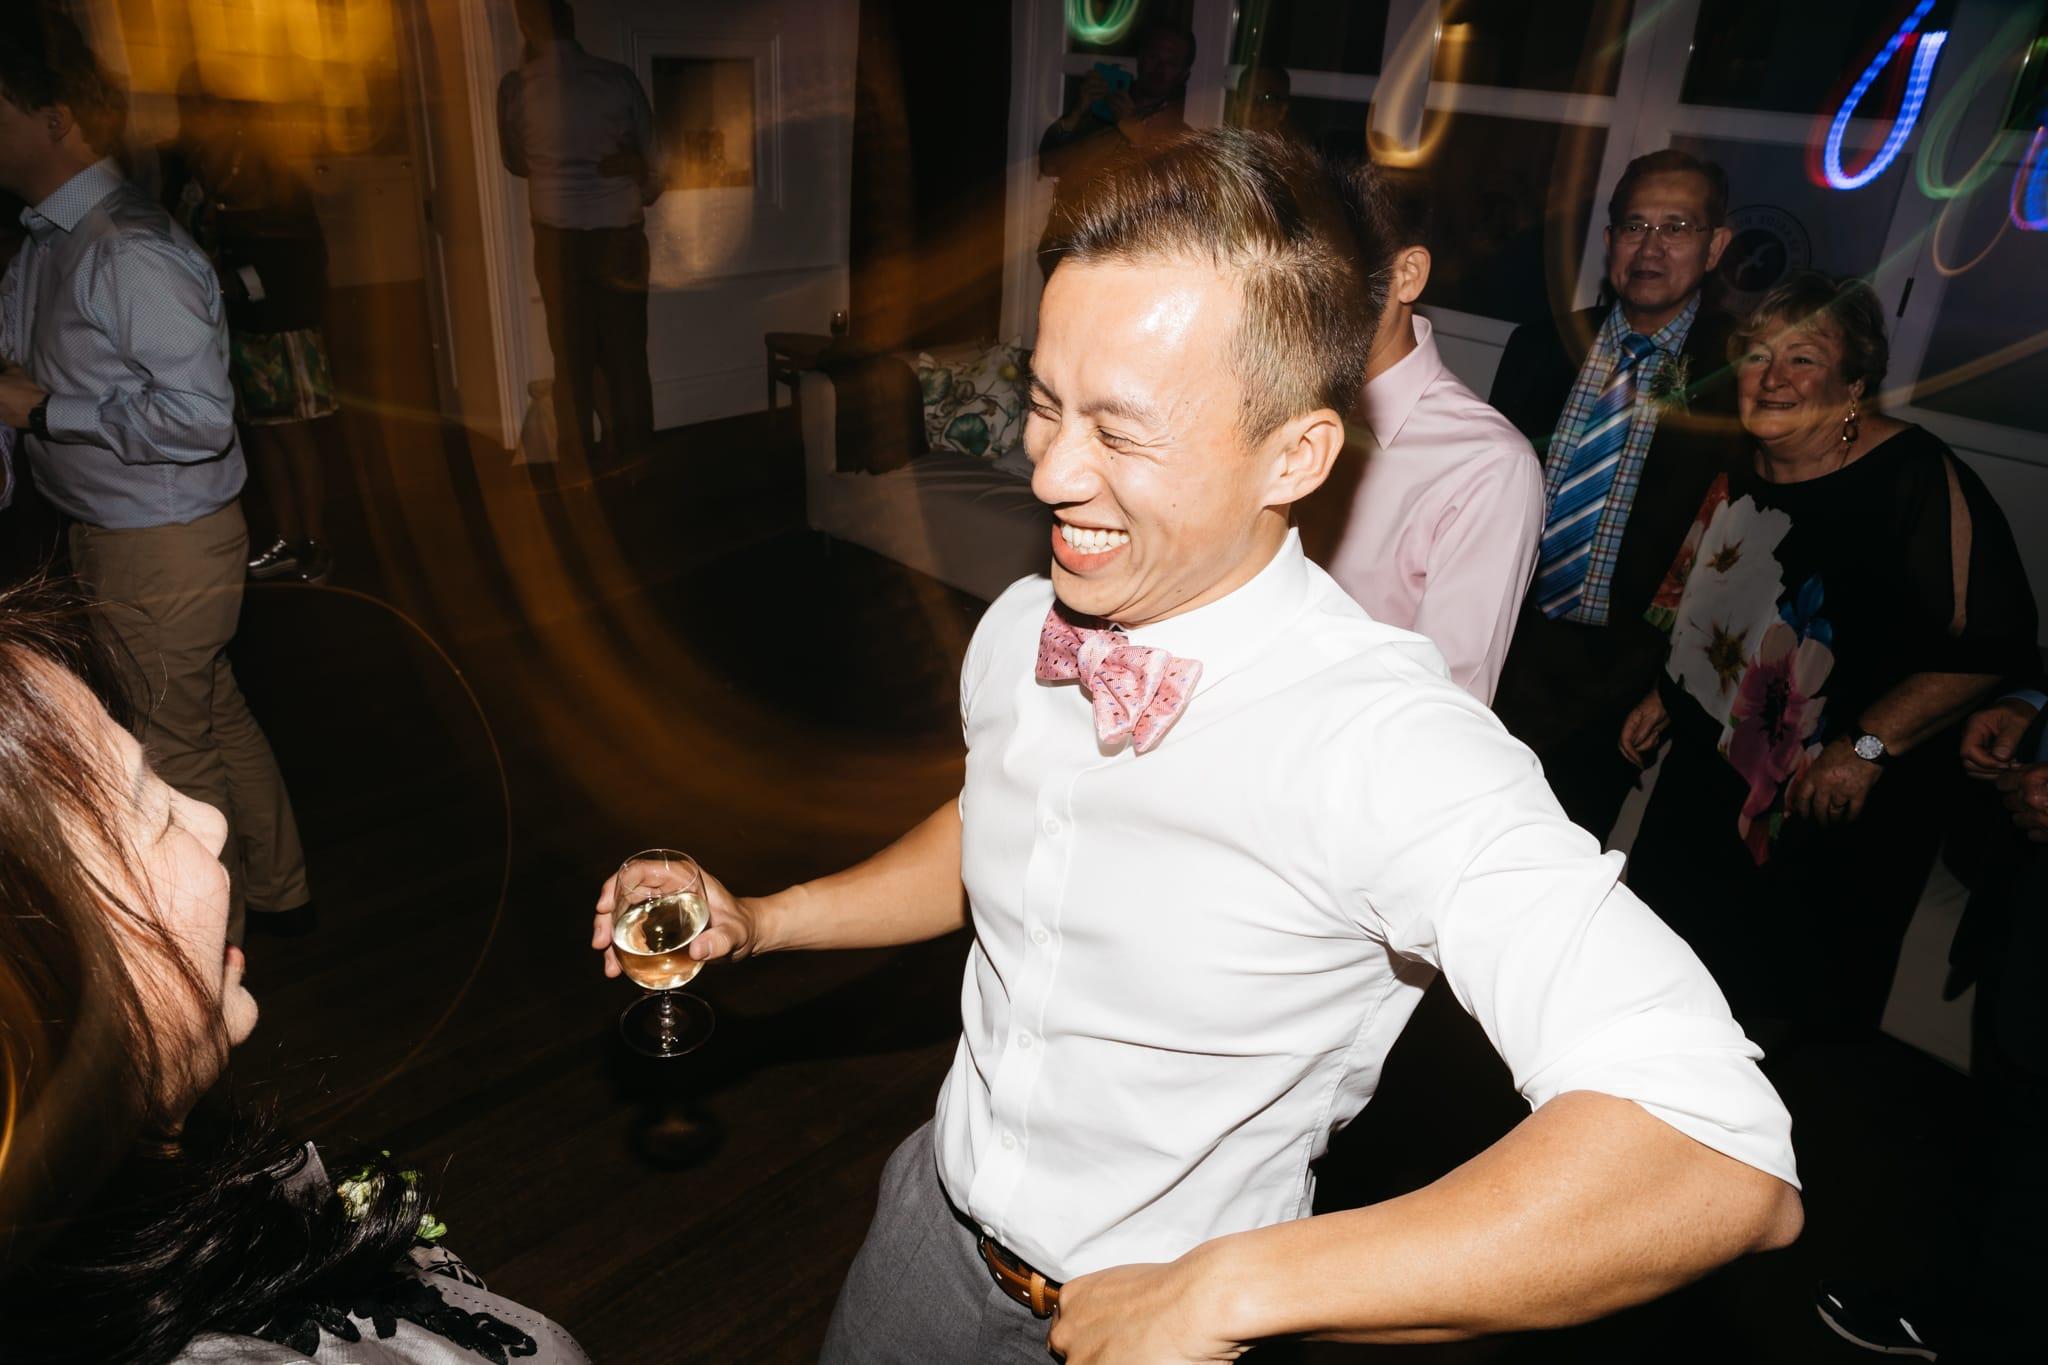 Groom dancing at wedding